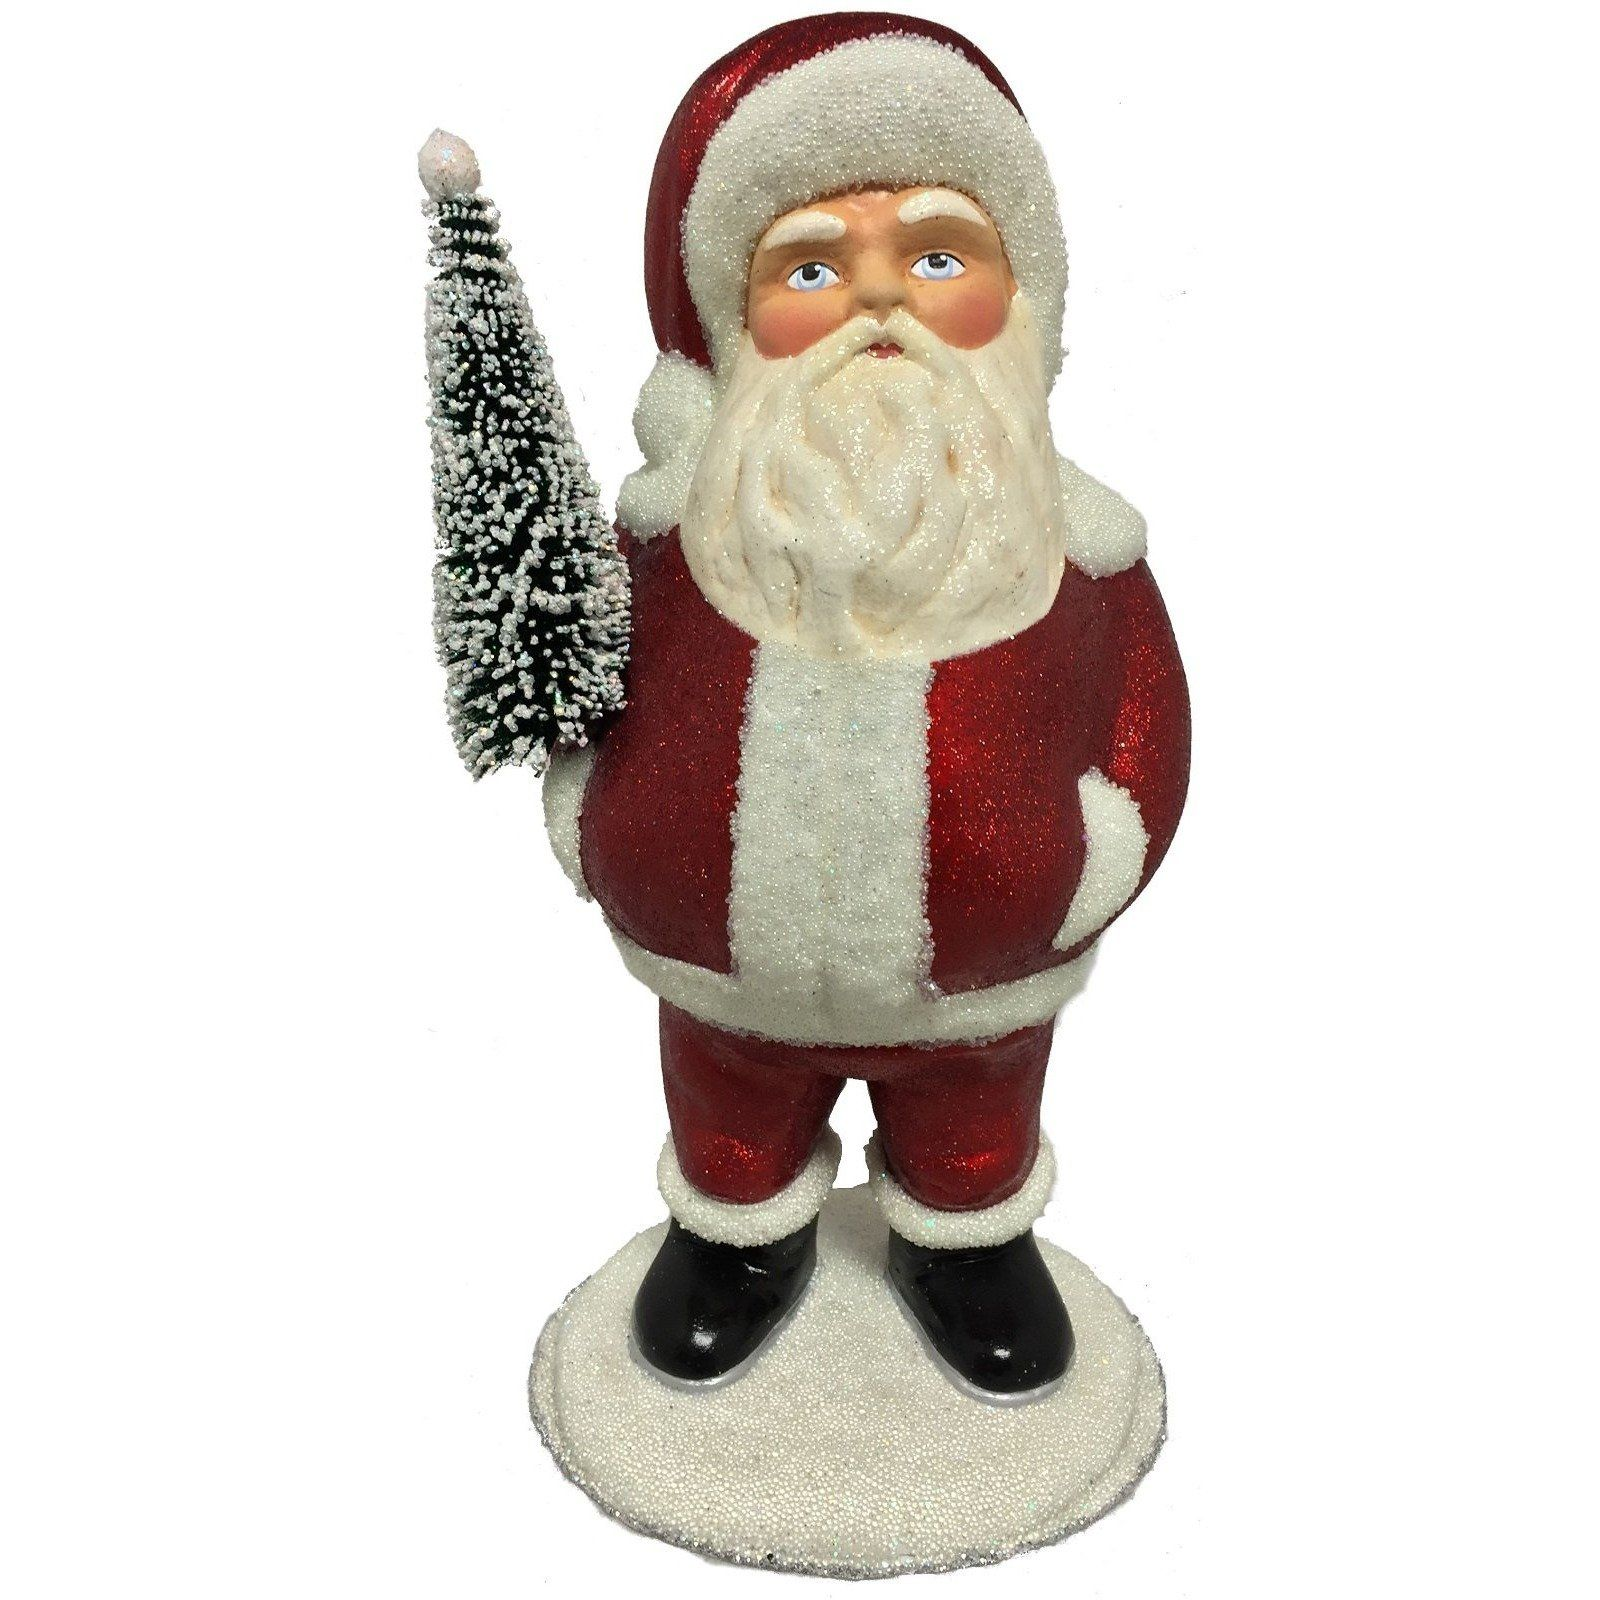 Paper Mache Ino Schaller Santa With Full Belly